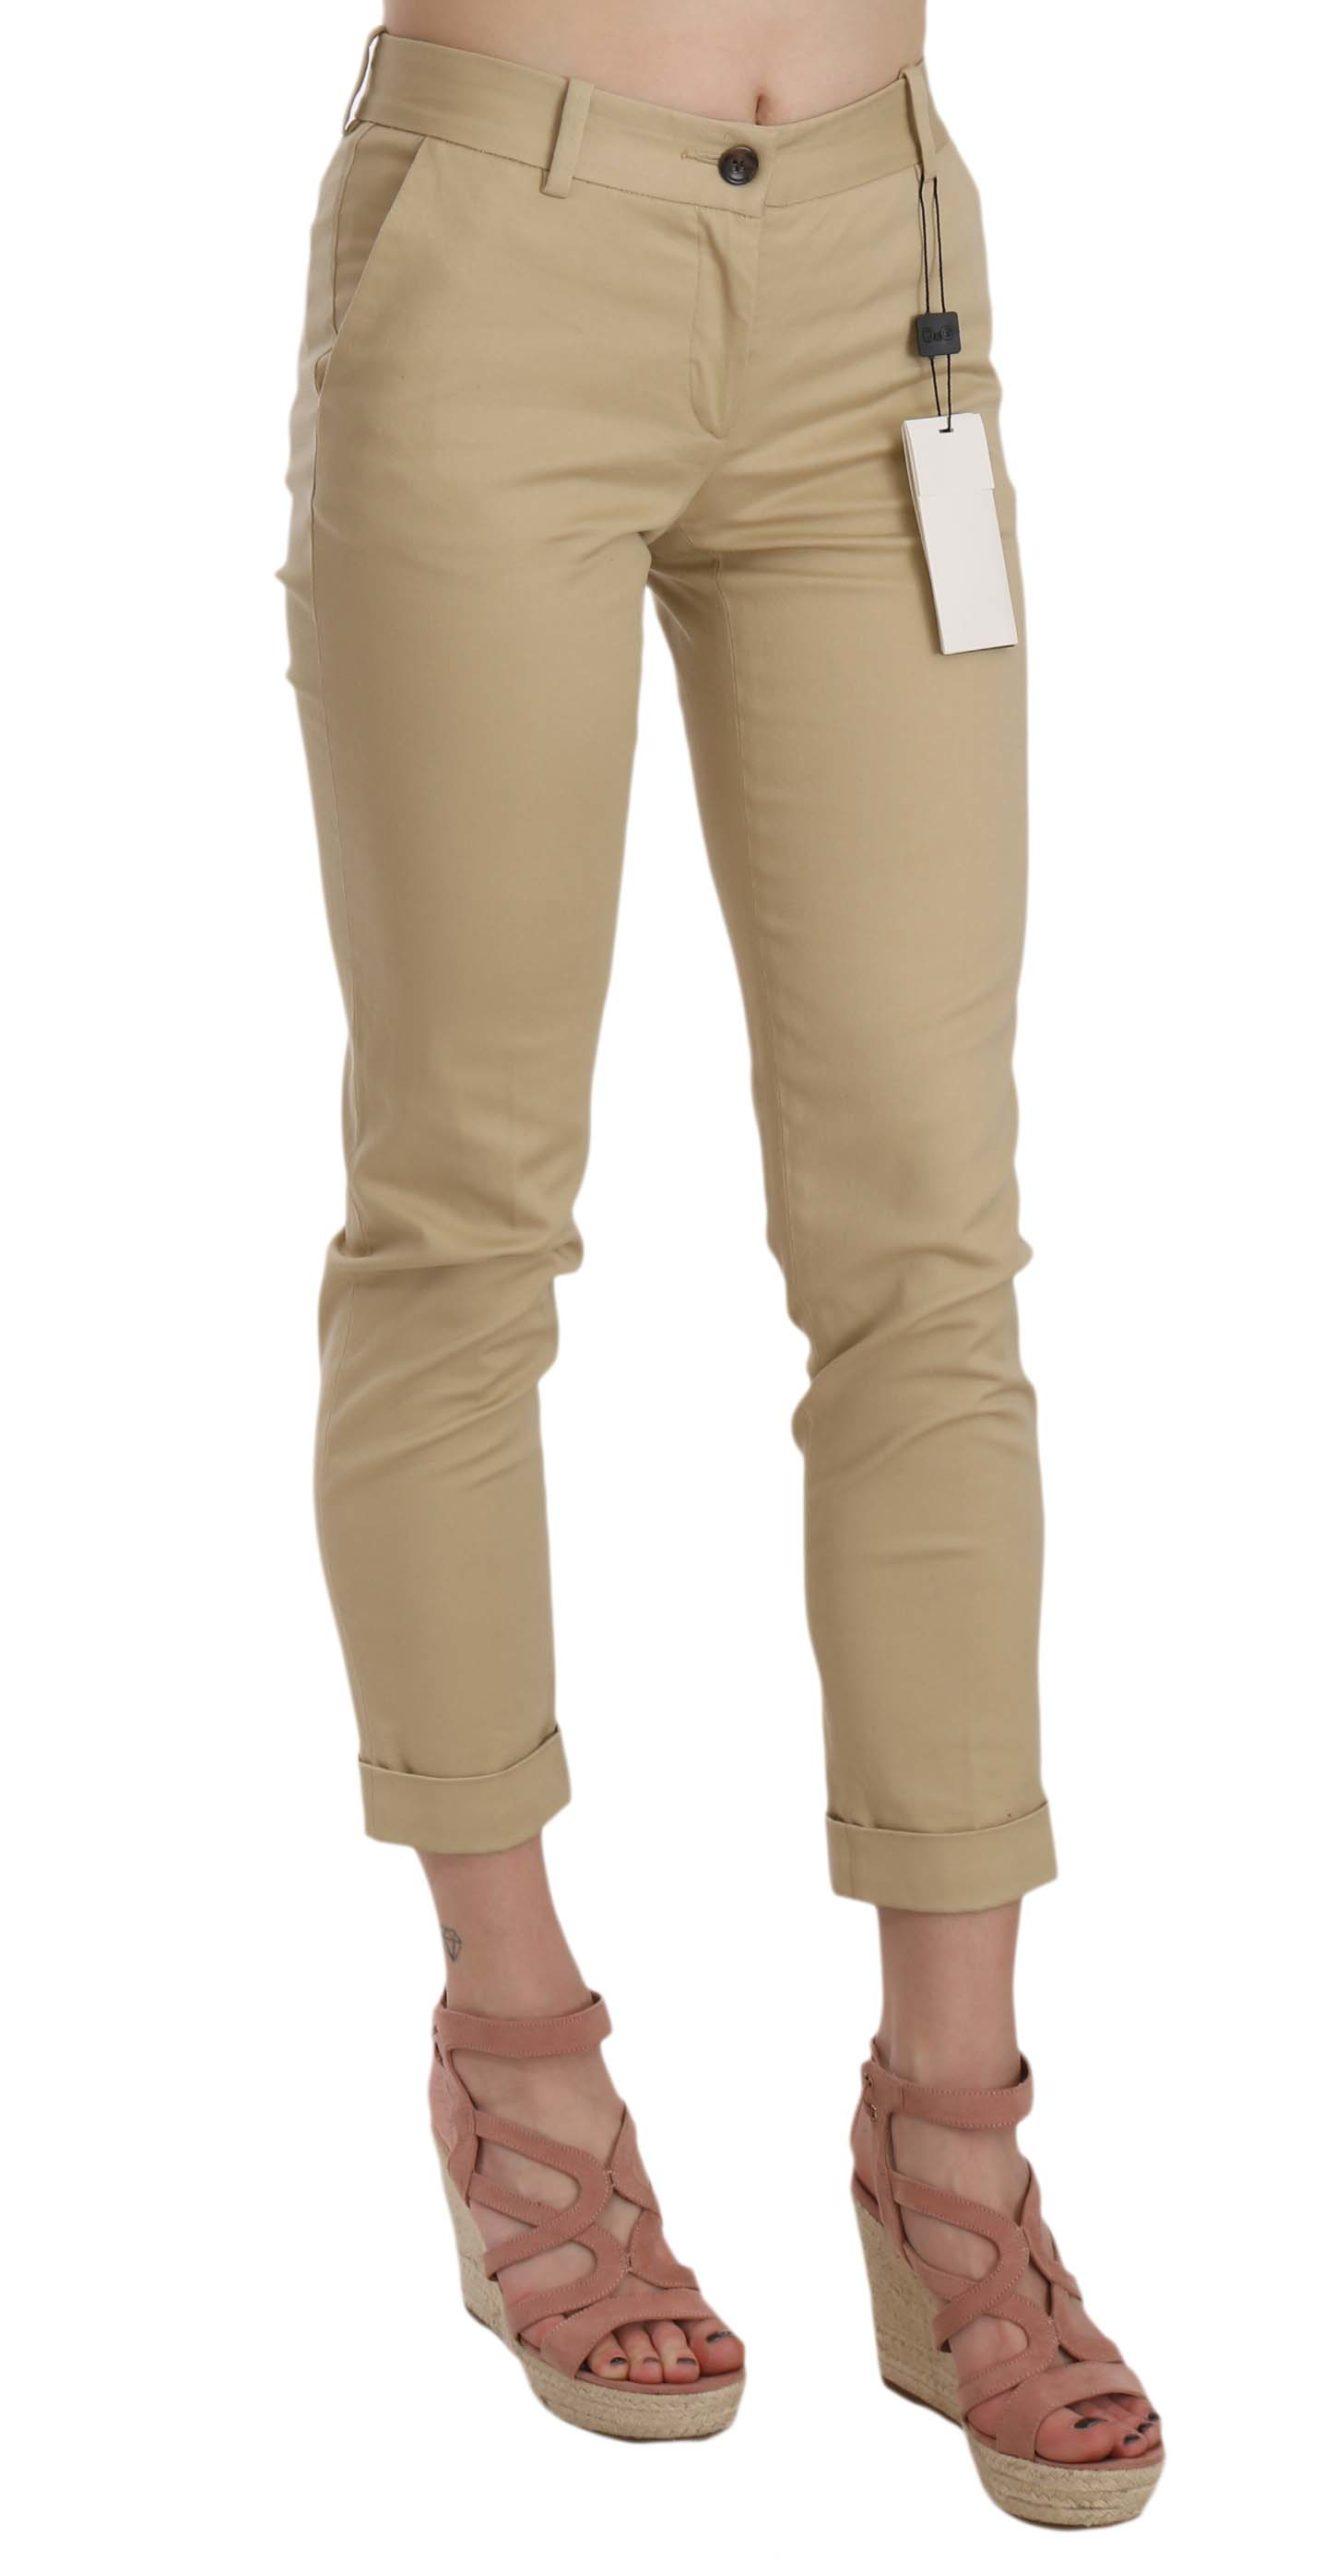 Dolce & Gabbana Women's Khaki Casual Fitted Cotton Trousers Khaki BYX1337 - IT36   XS